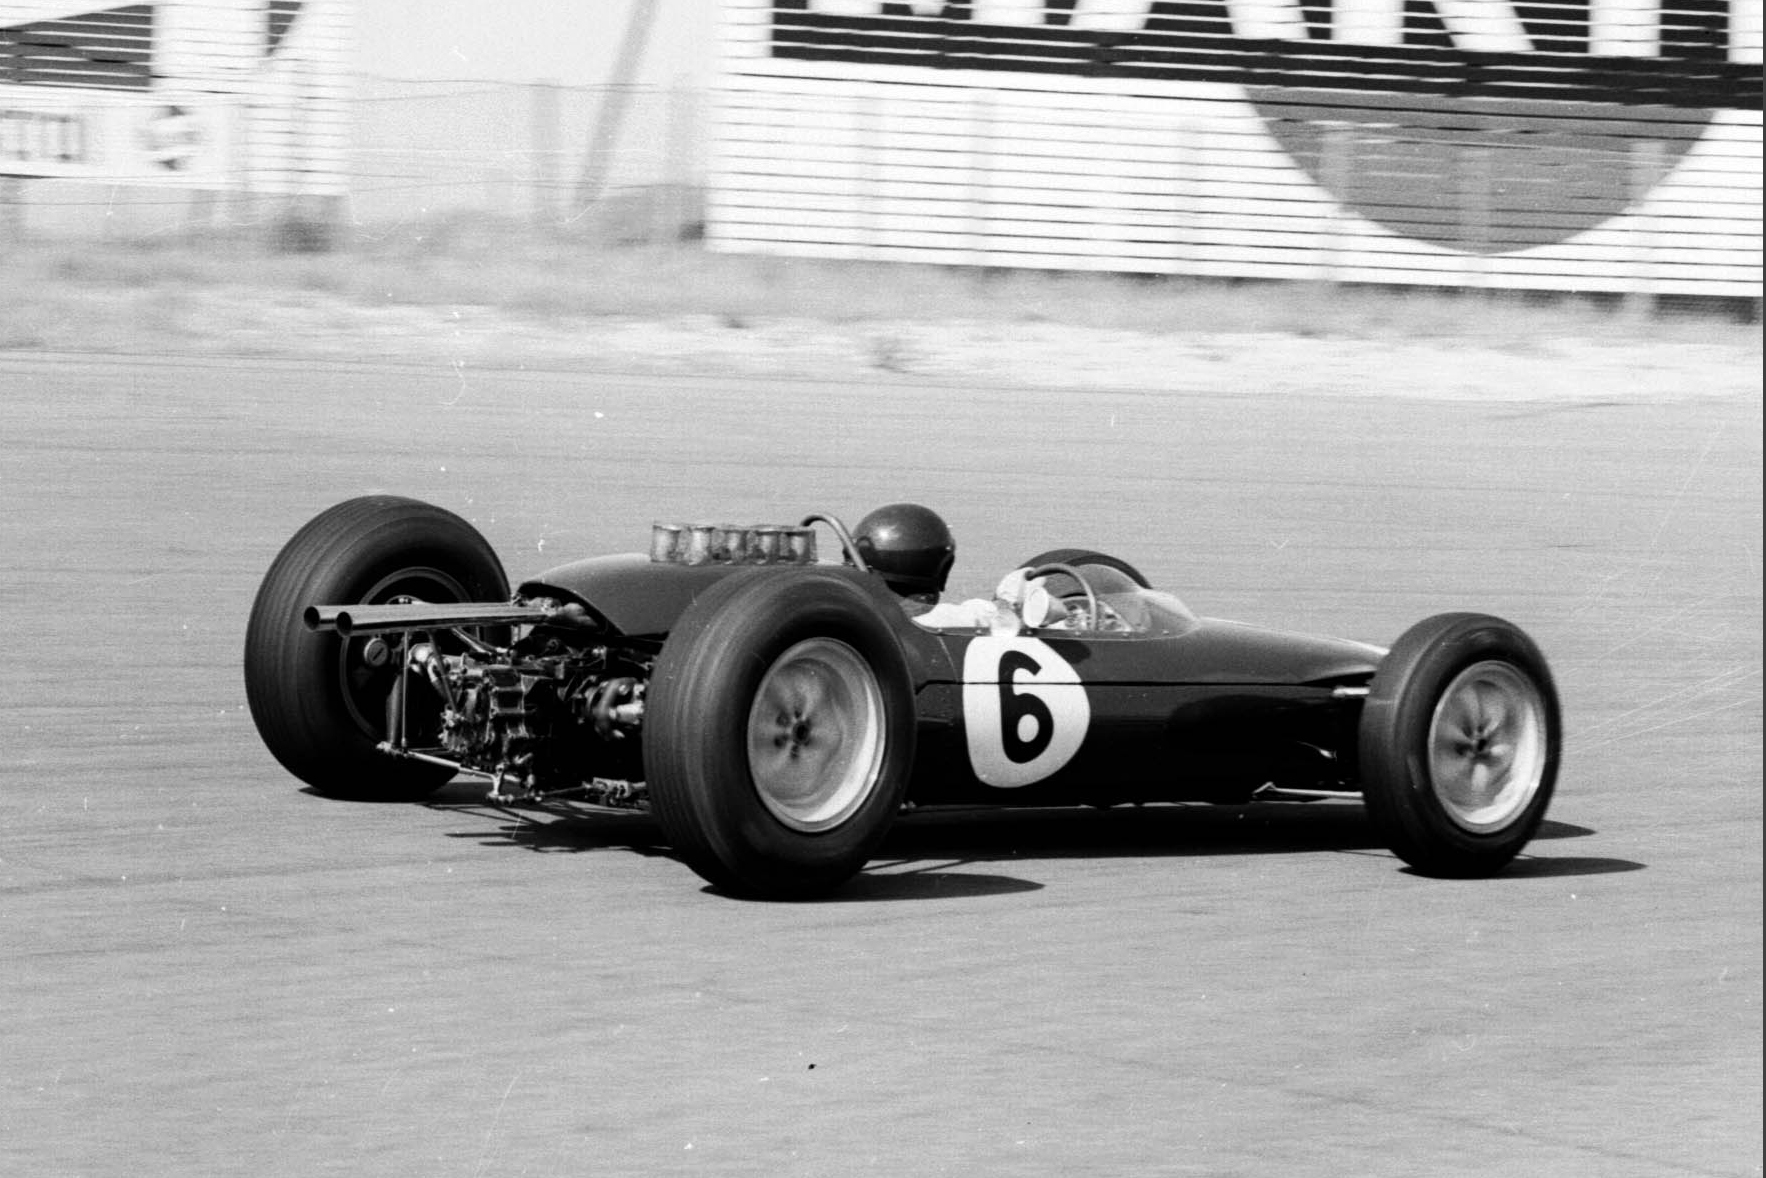 Jim Clark in his Lotus 25 Climax.